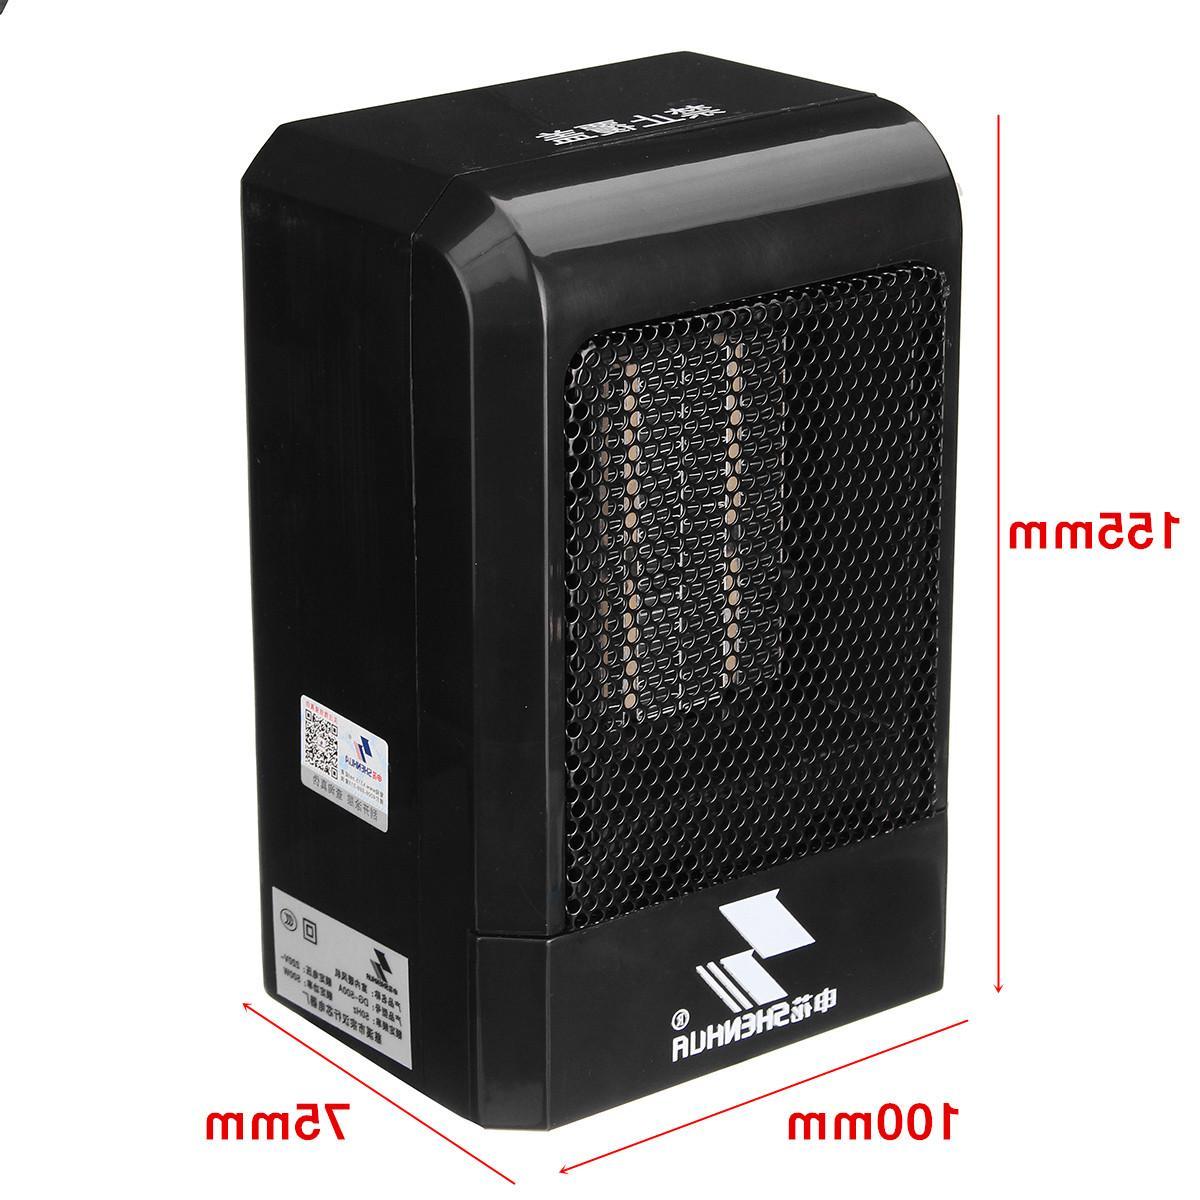 500W Portable <font><b>Mini</b></font> <font><b>Fan</b></font> <font><b>Space</b></font> US Home Office Conditioner Heating